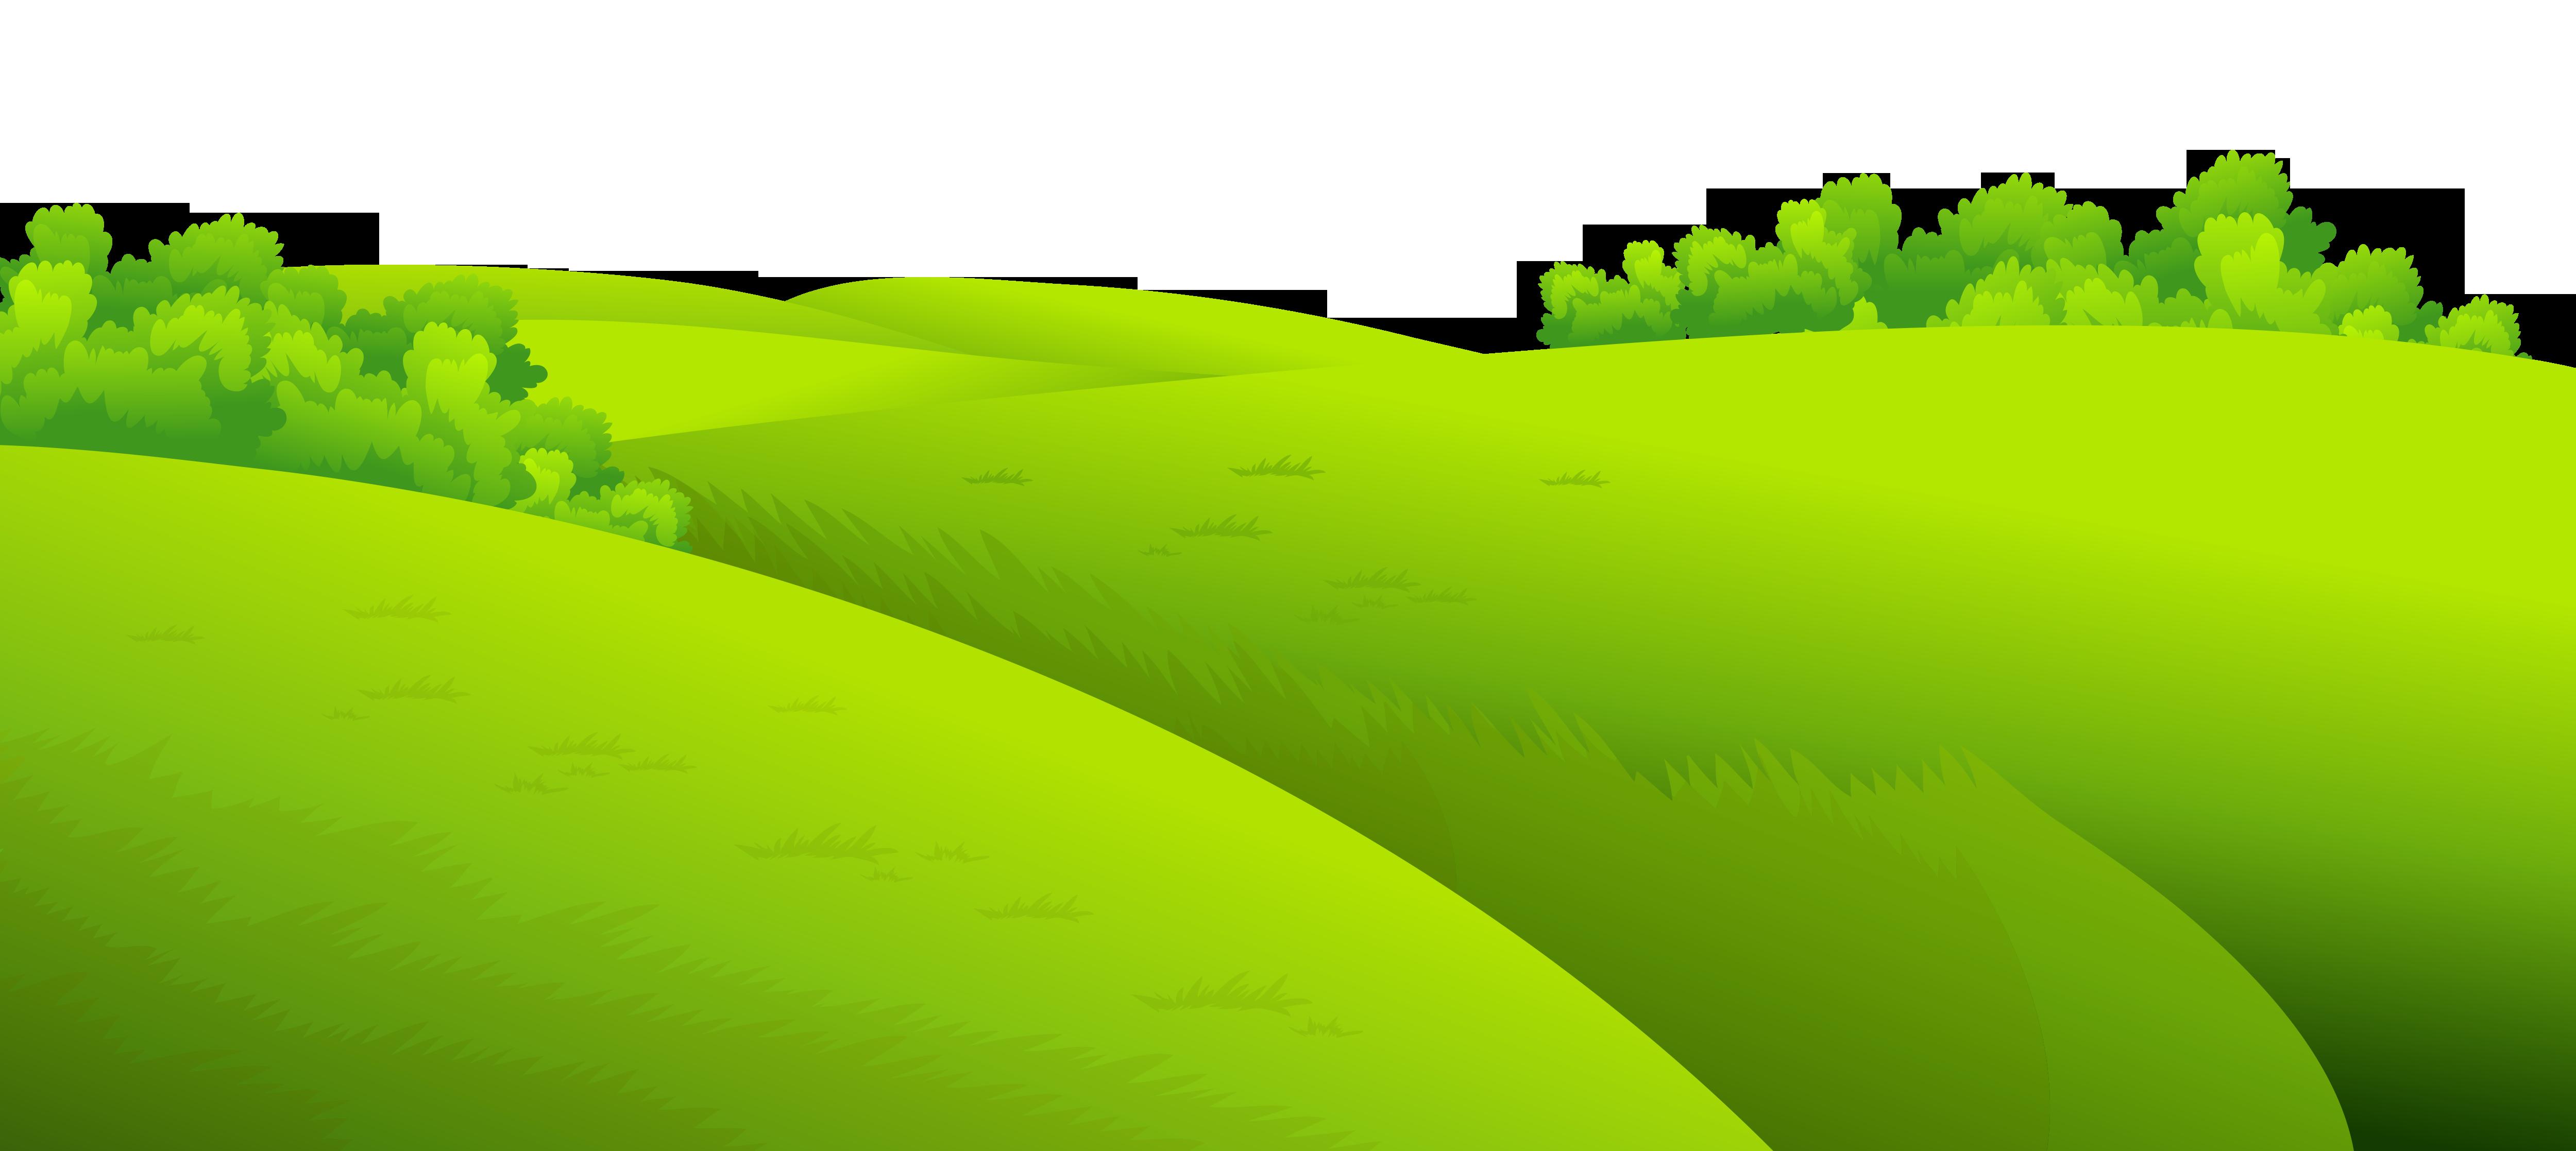 Hills clipart background, Hills background Transparent FREE.